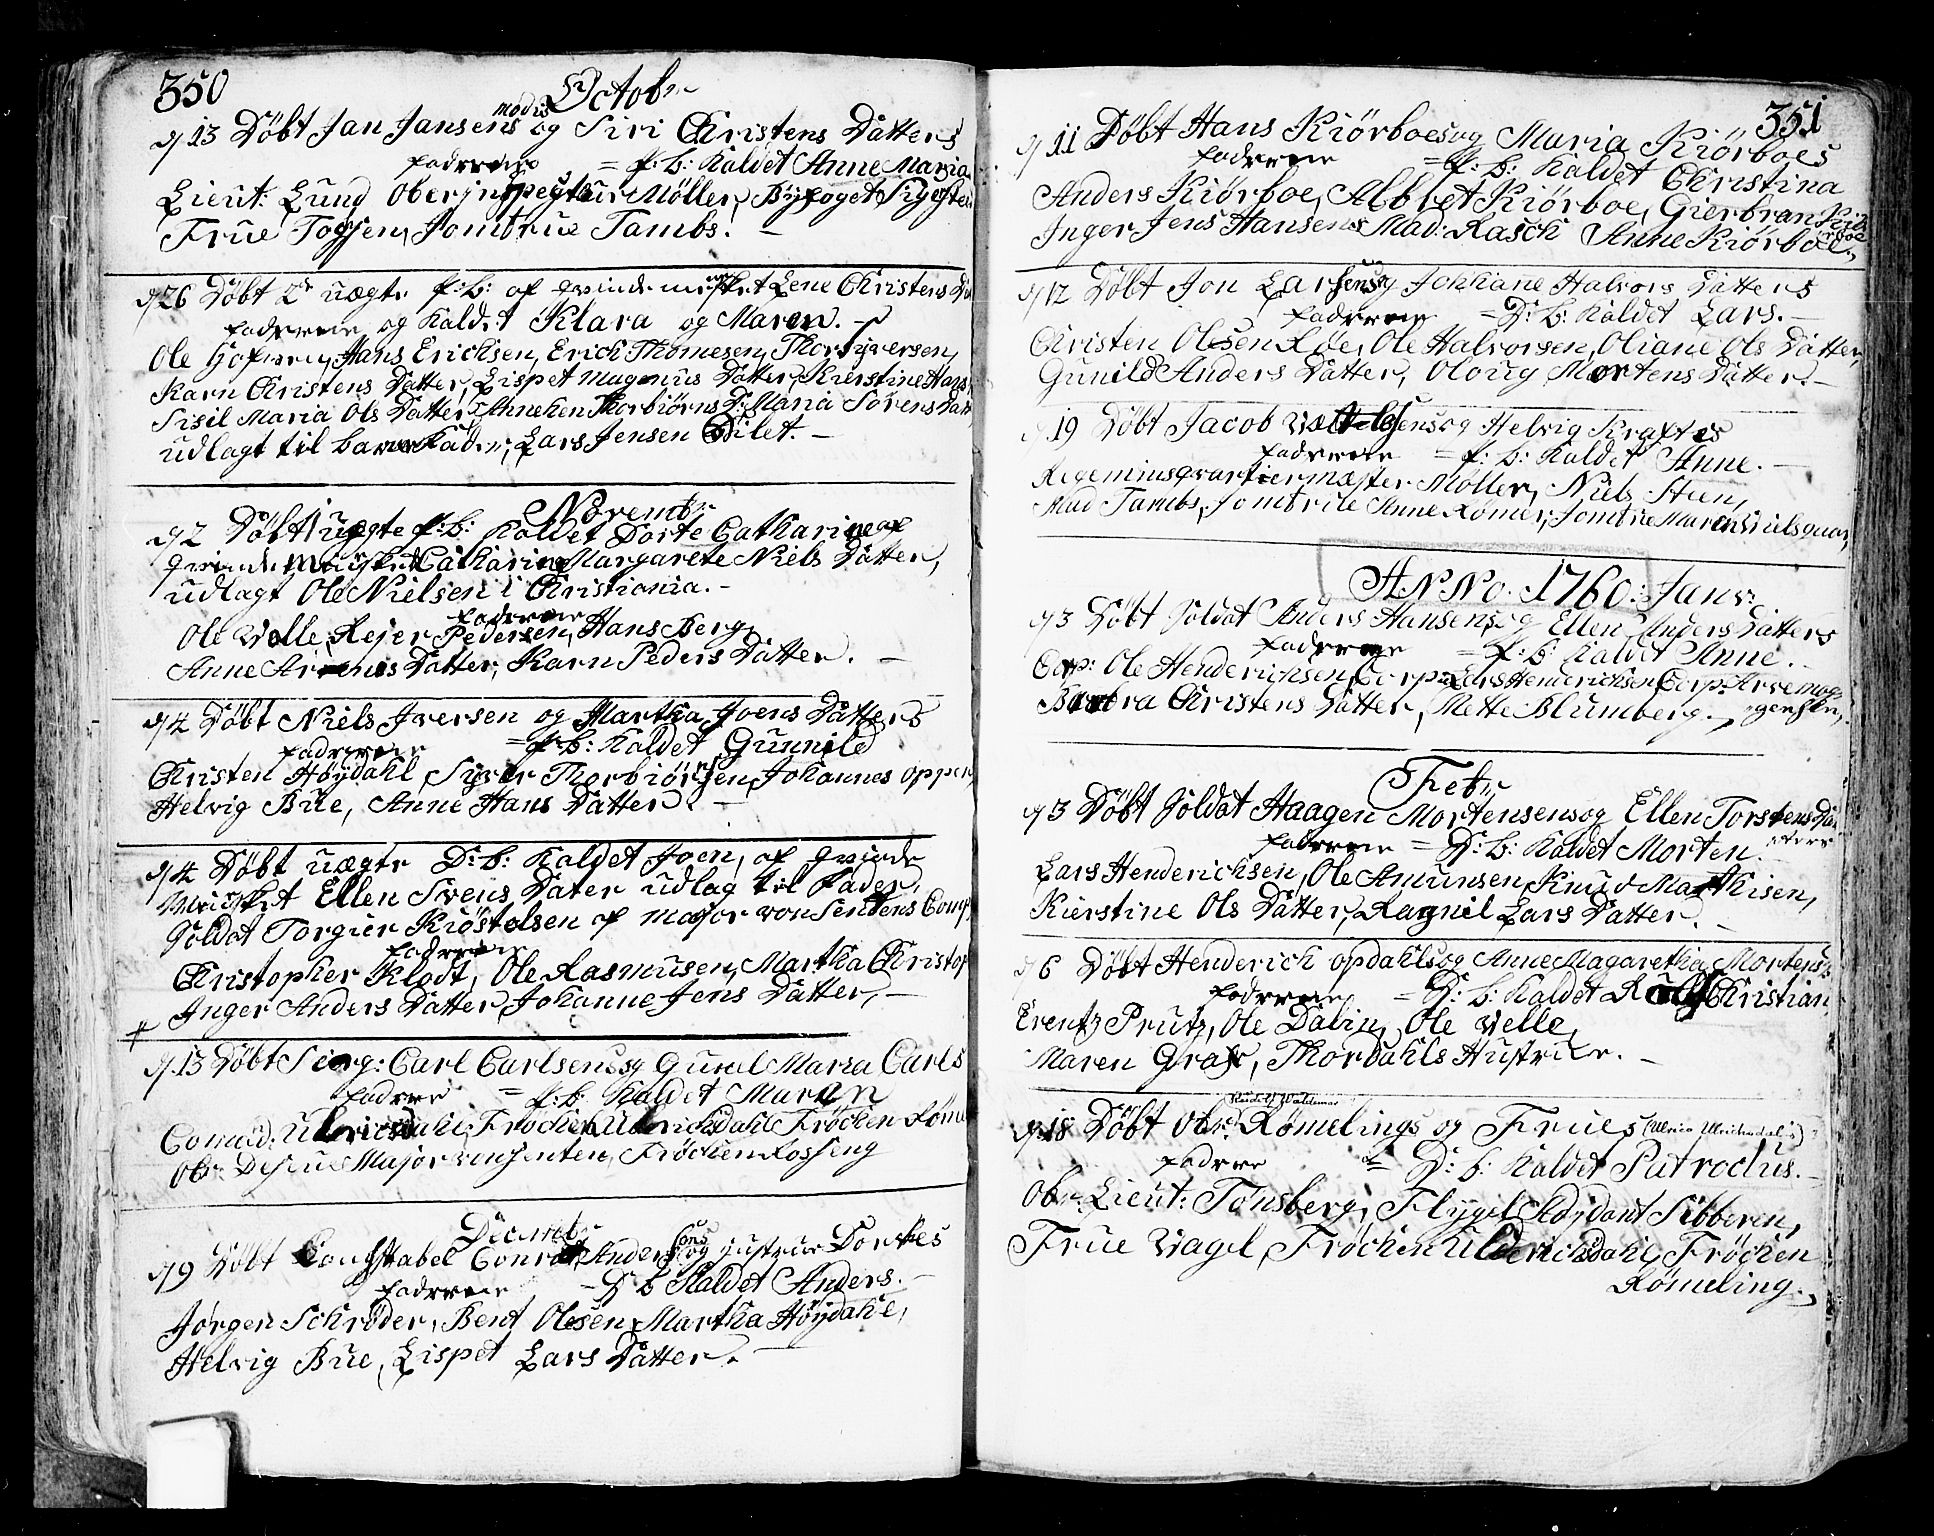 SAO, Fredrikstad prestekontor Kirkebøker, F/Fa/L0002: Ministerialbok nr. 2, 1750-1804, s. 350-351